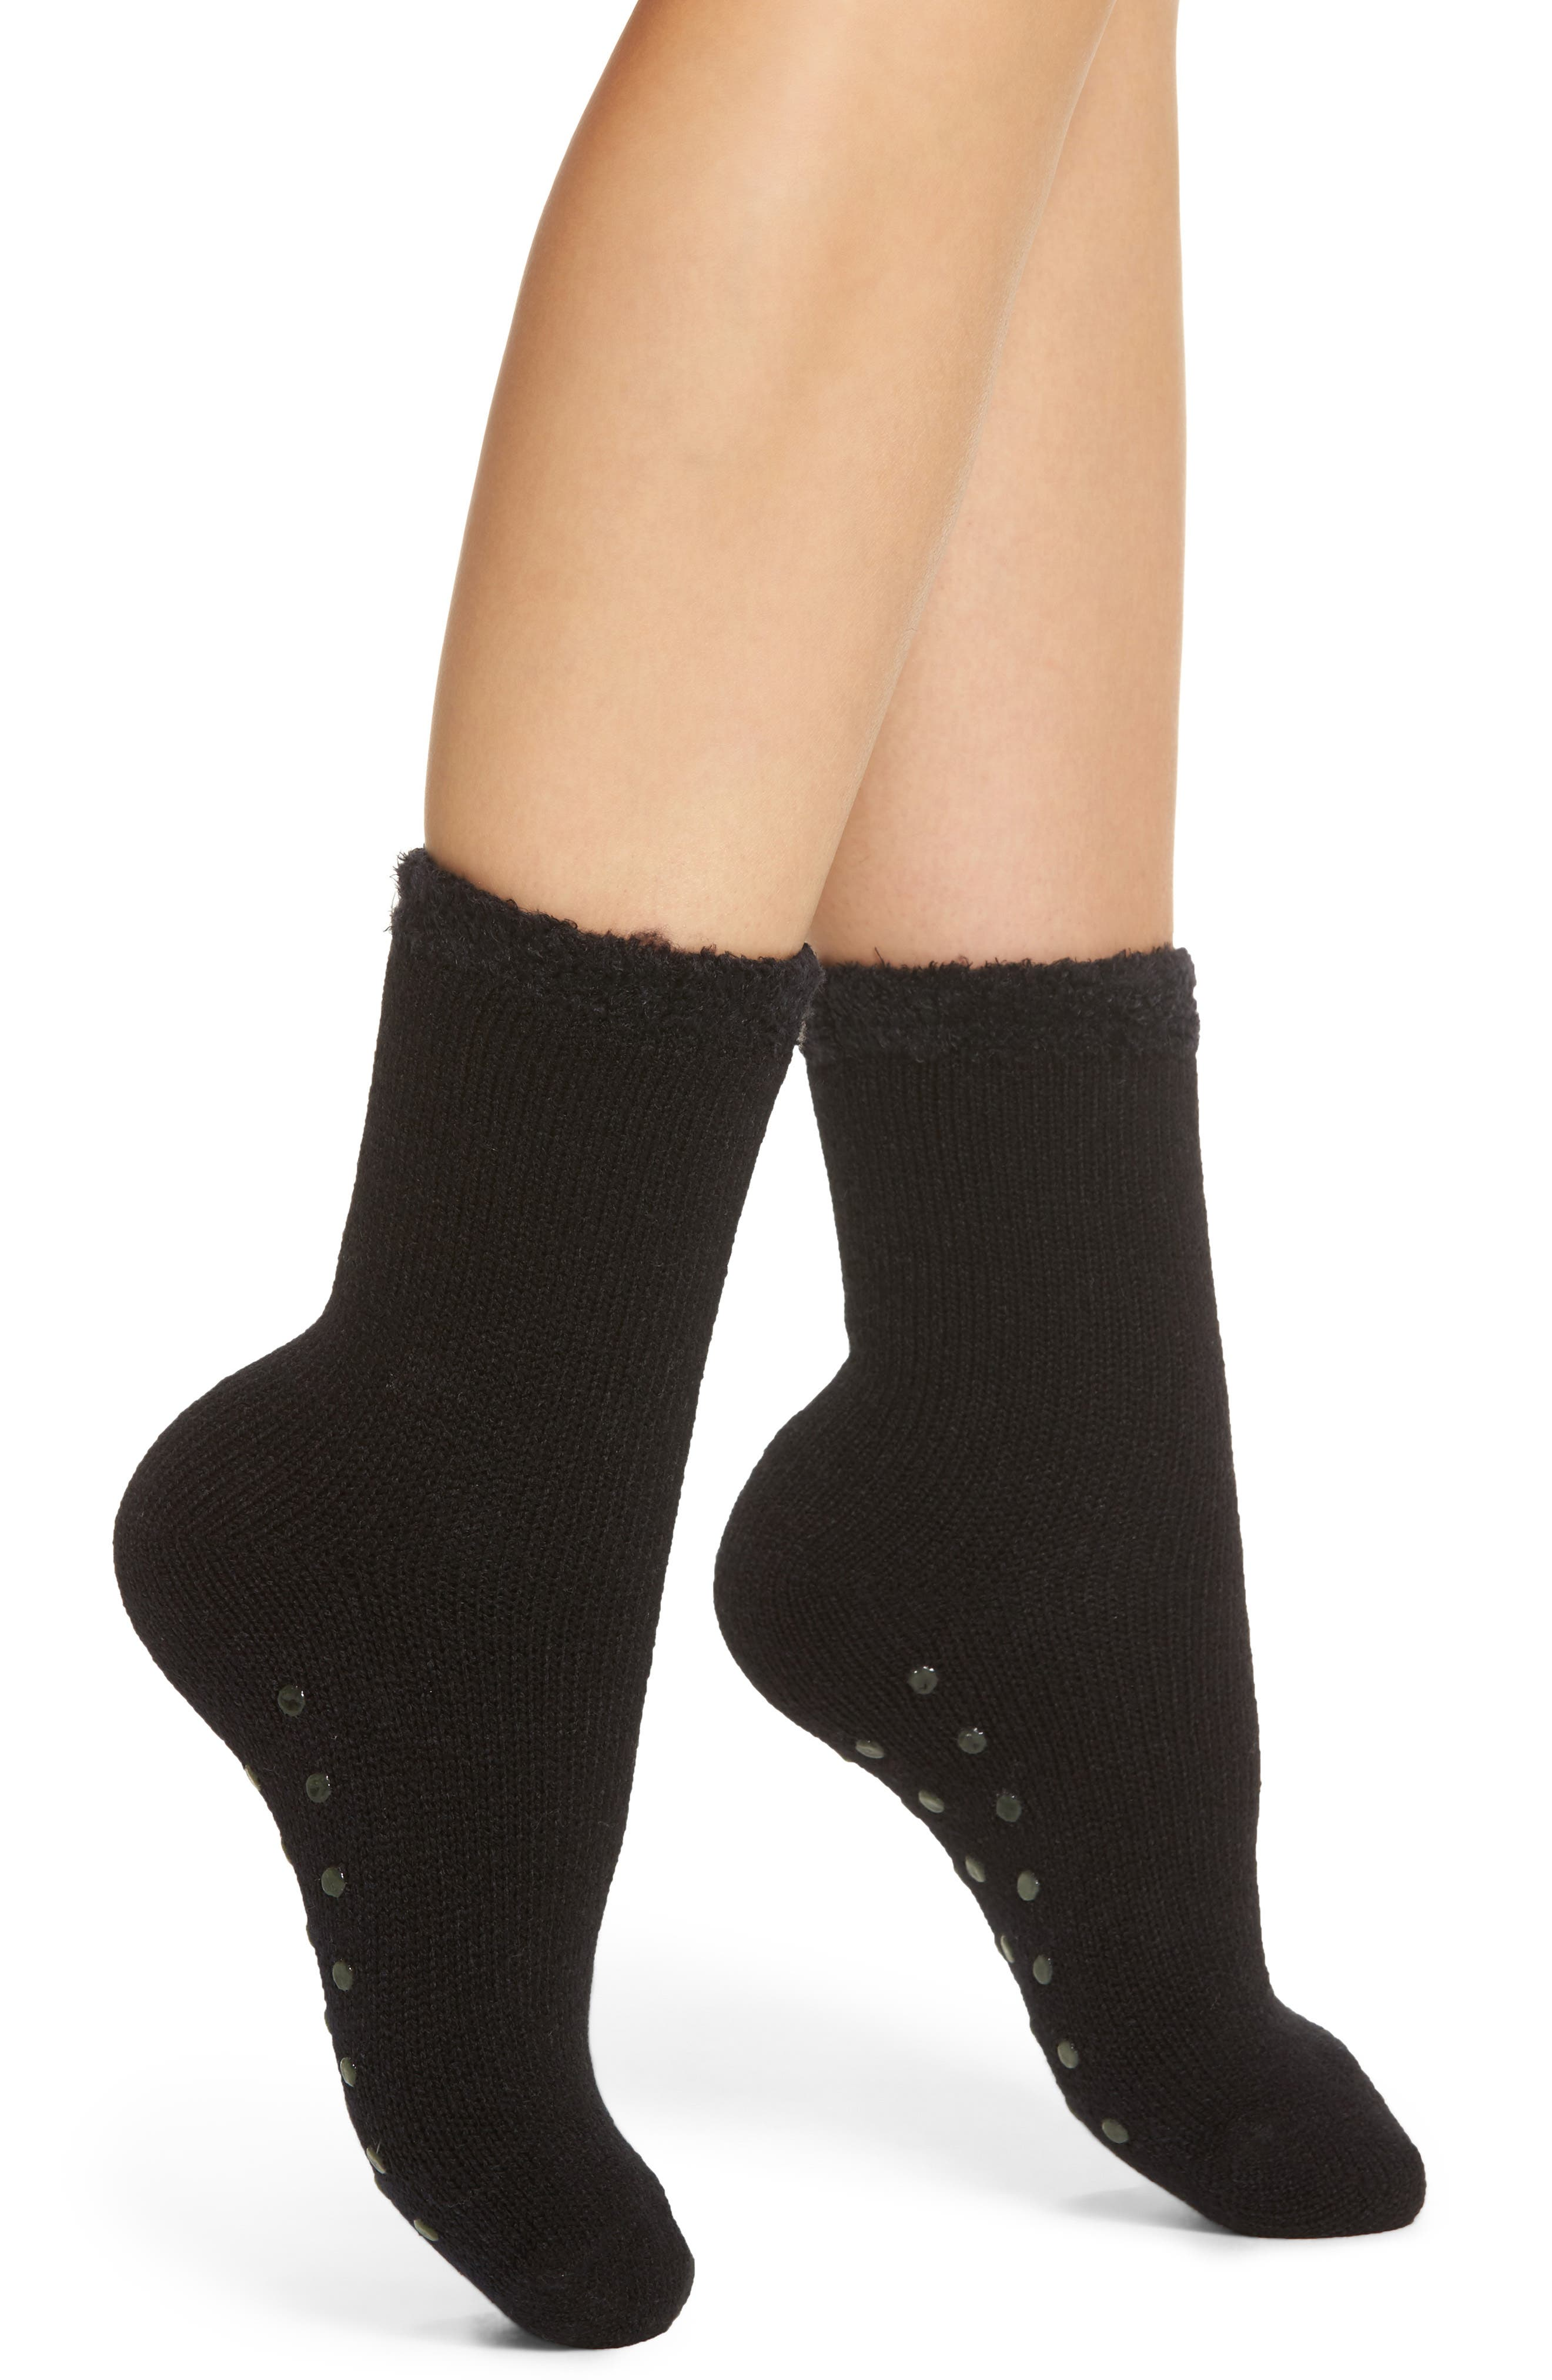 Alternate Image 1 Selected - Nordstrom Butter Cuff Socks